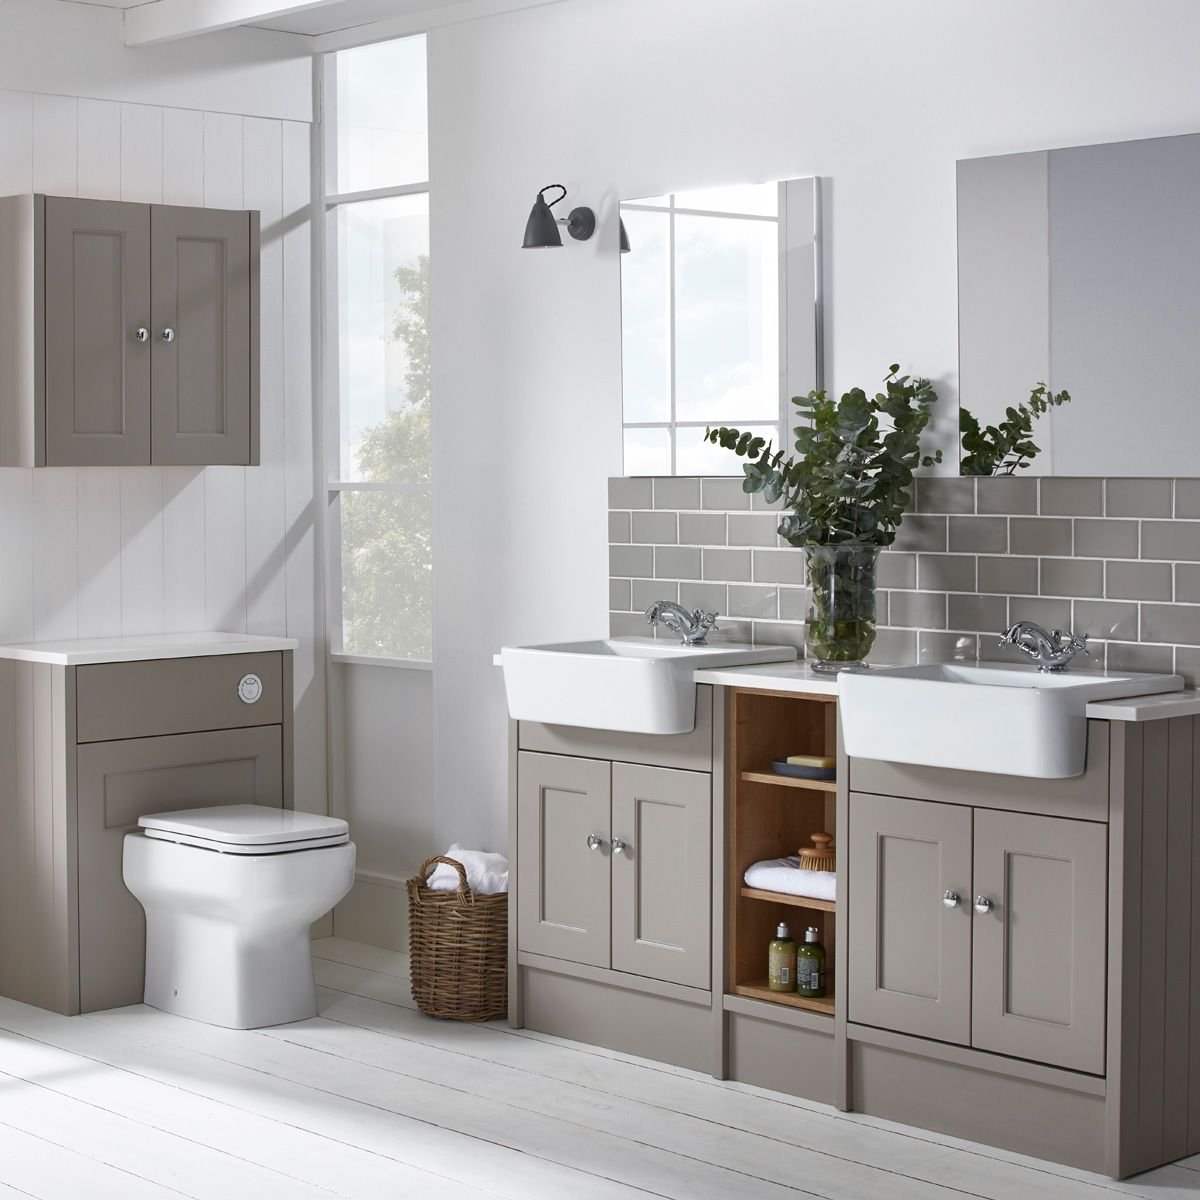 Roper Rhodes Burford Mocha His and Hers | bathroom | Pinterest ...